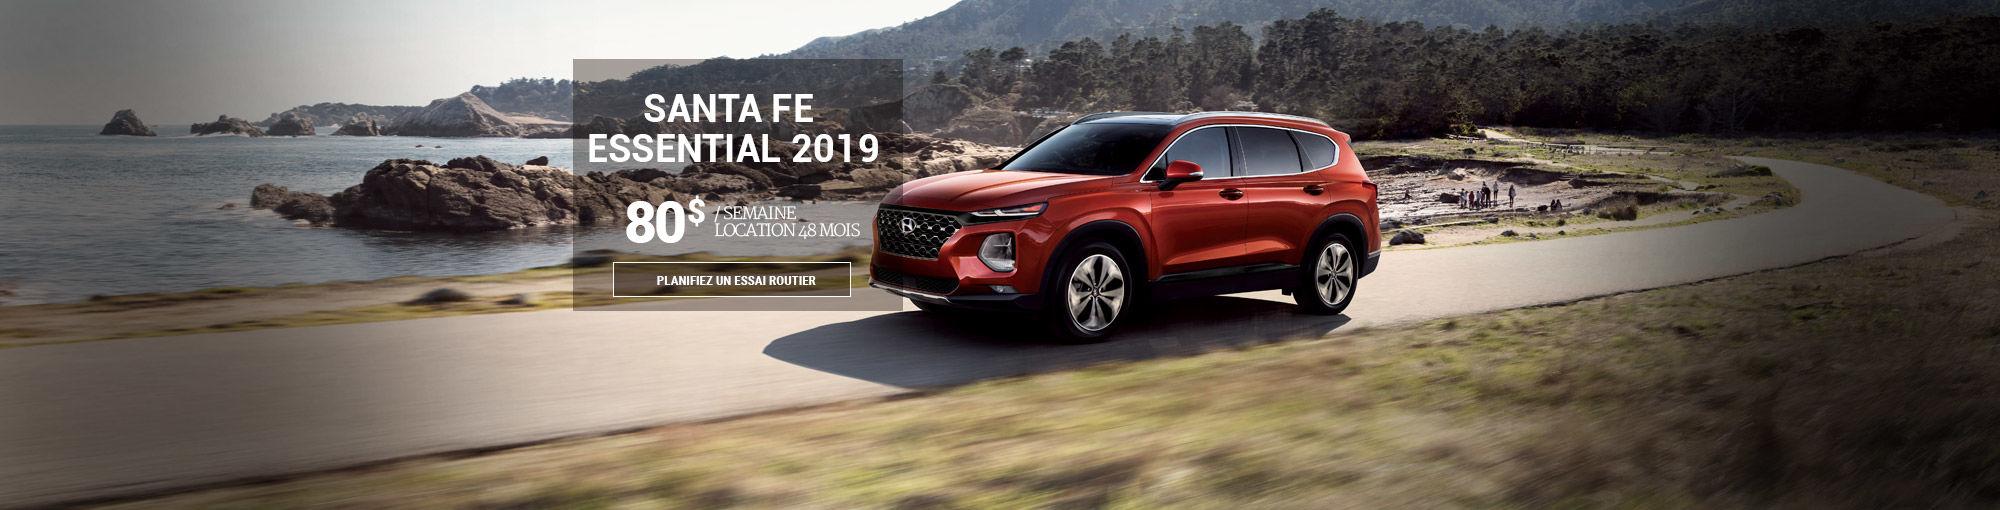 Hyundai Santa Fe 2019 header janvier